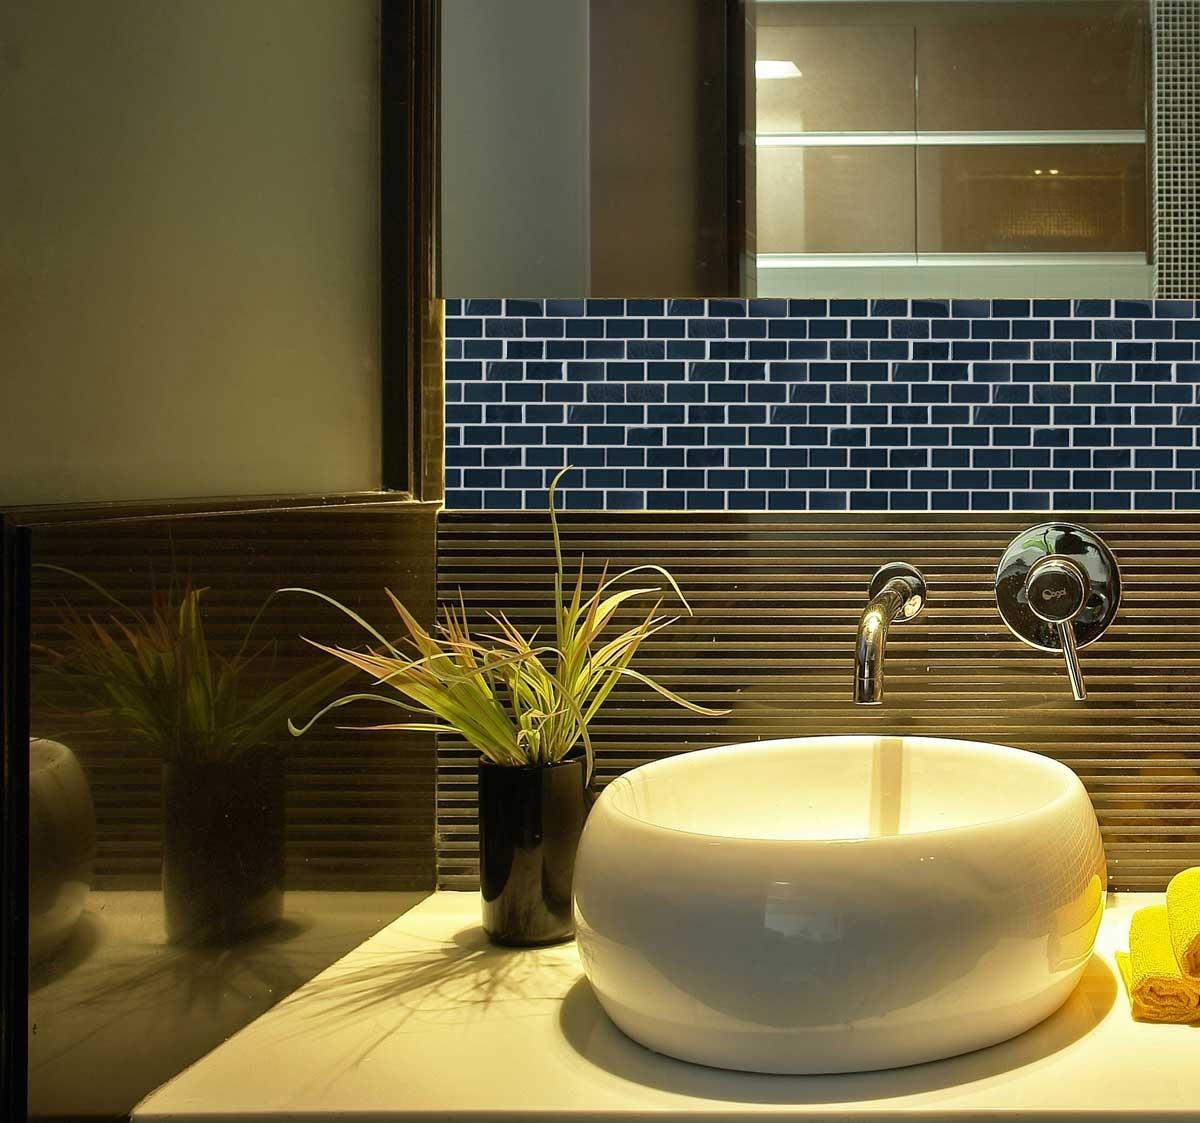 "Landscape 1"" x 2"" Textured Black Glass Brick Backsplash Mosaic Wall & Floor Tile"